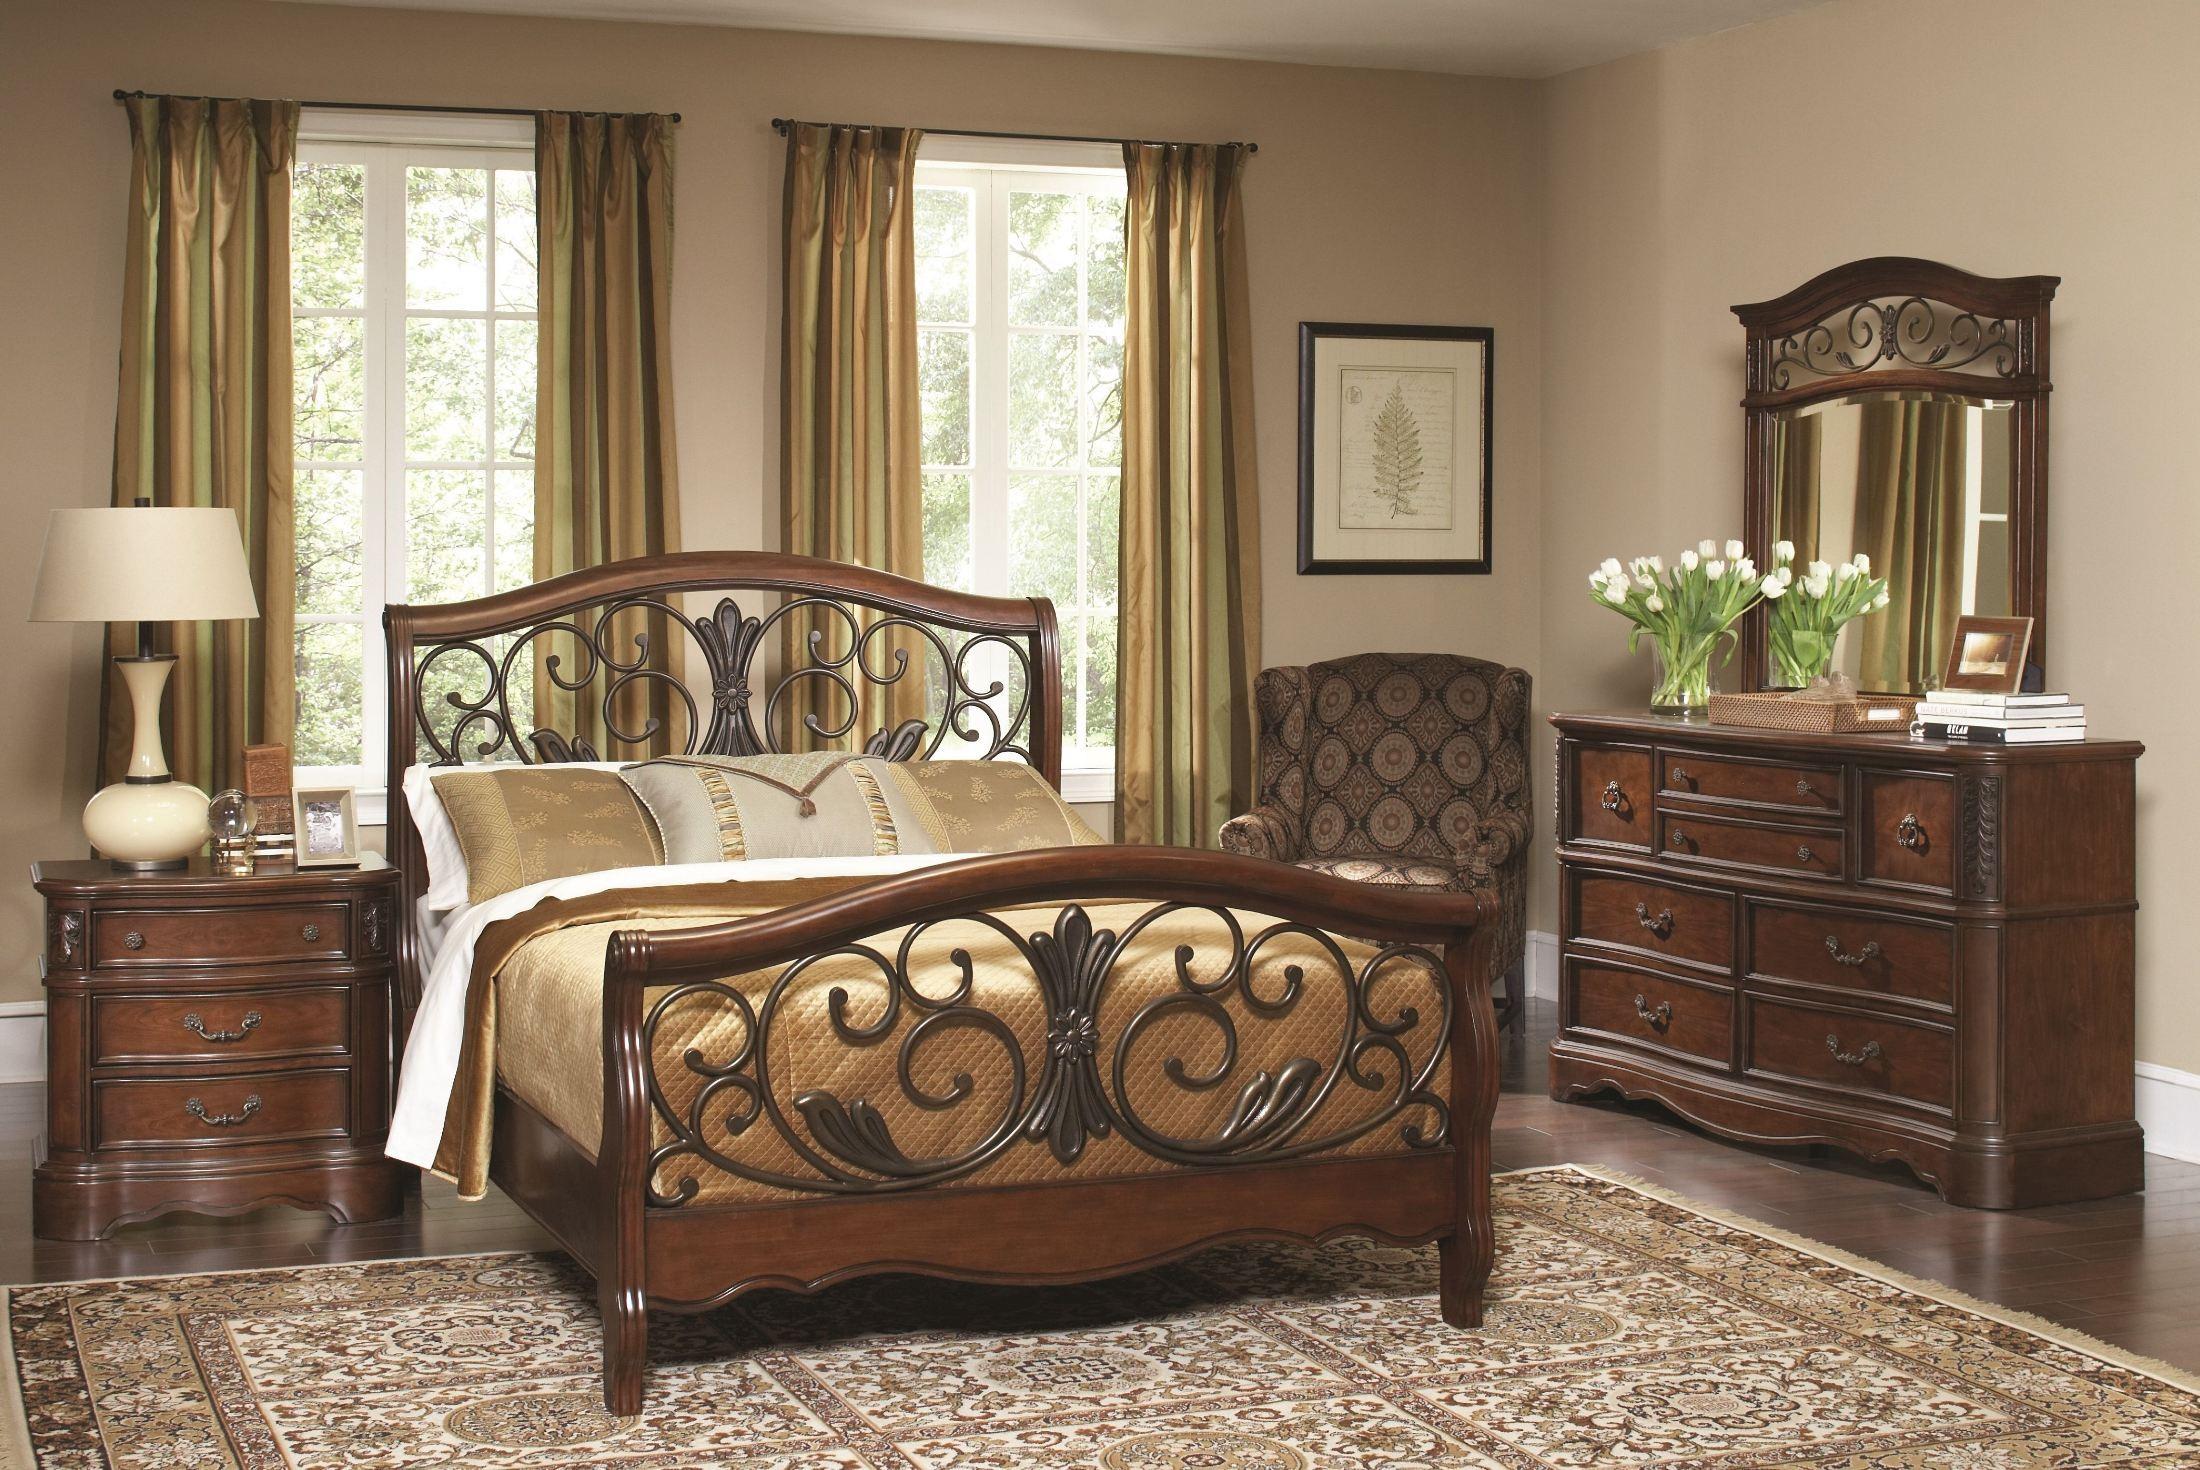 Belle Meade Courtyard Cherry Queen Panel Bed B1095 52h 52f 5262r Largo Furniture